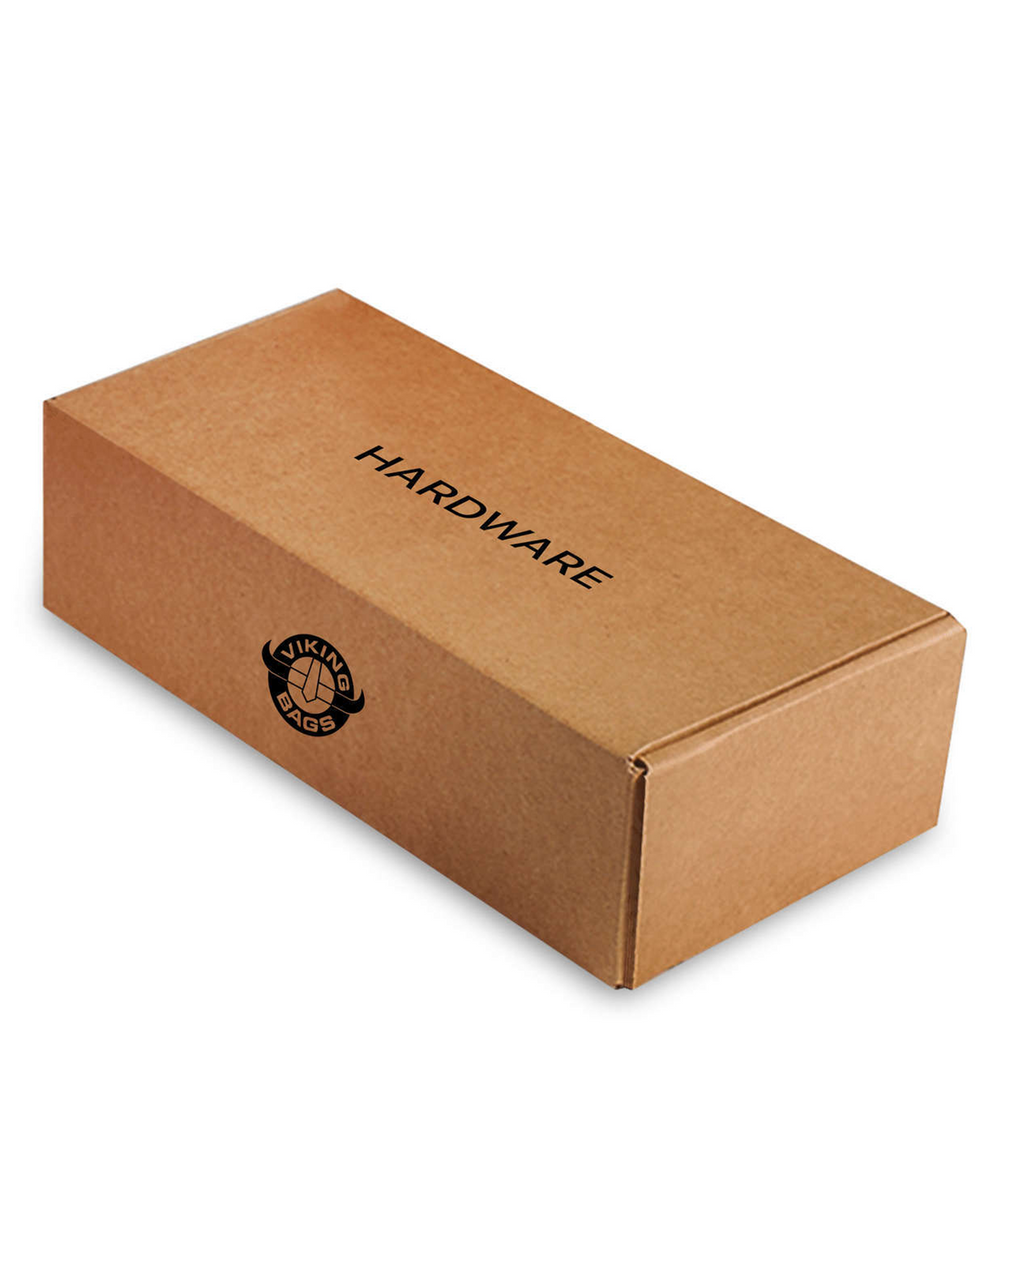 Honda 1100 Shadow Aero Viking Lamellar Large Black Hard Saddlebags Box